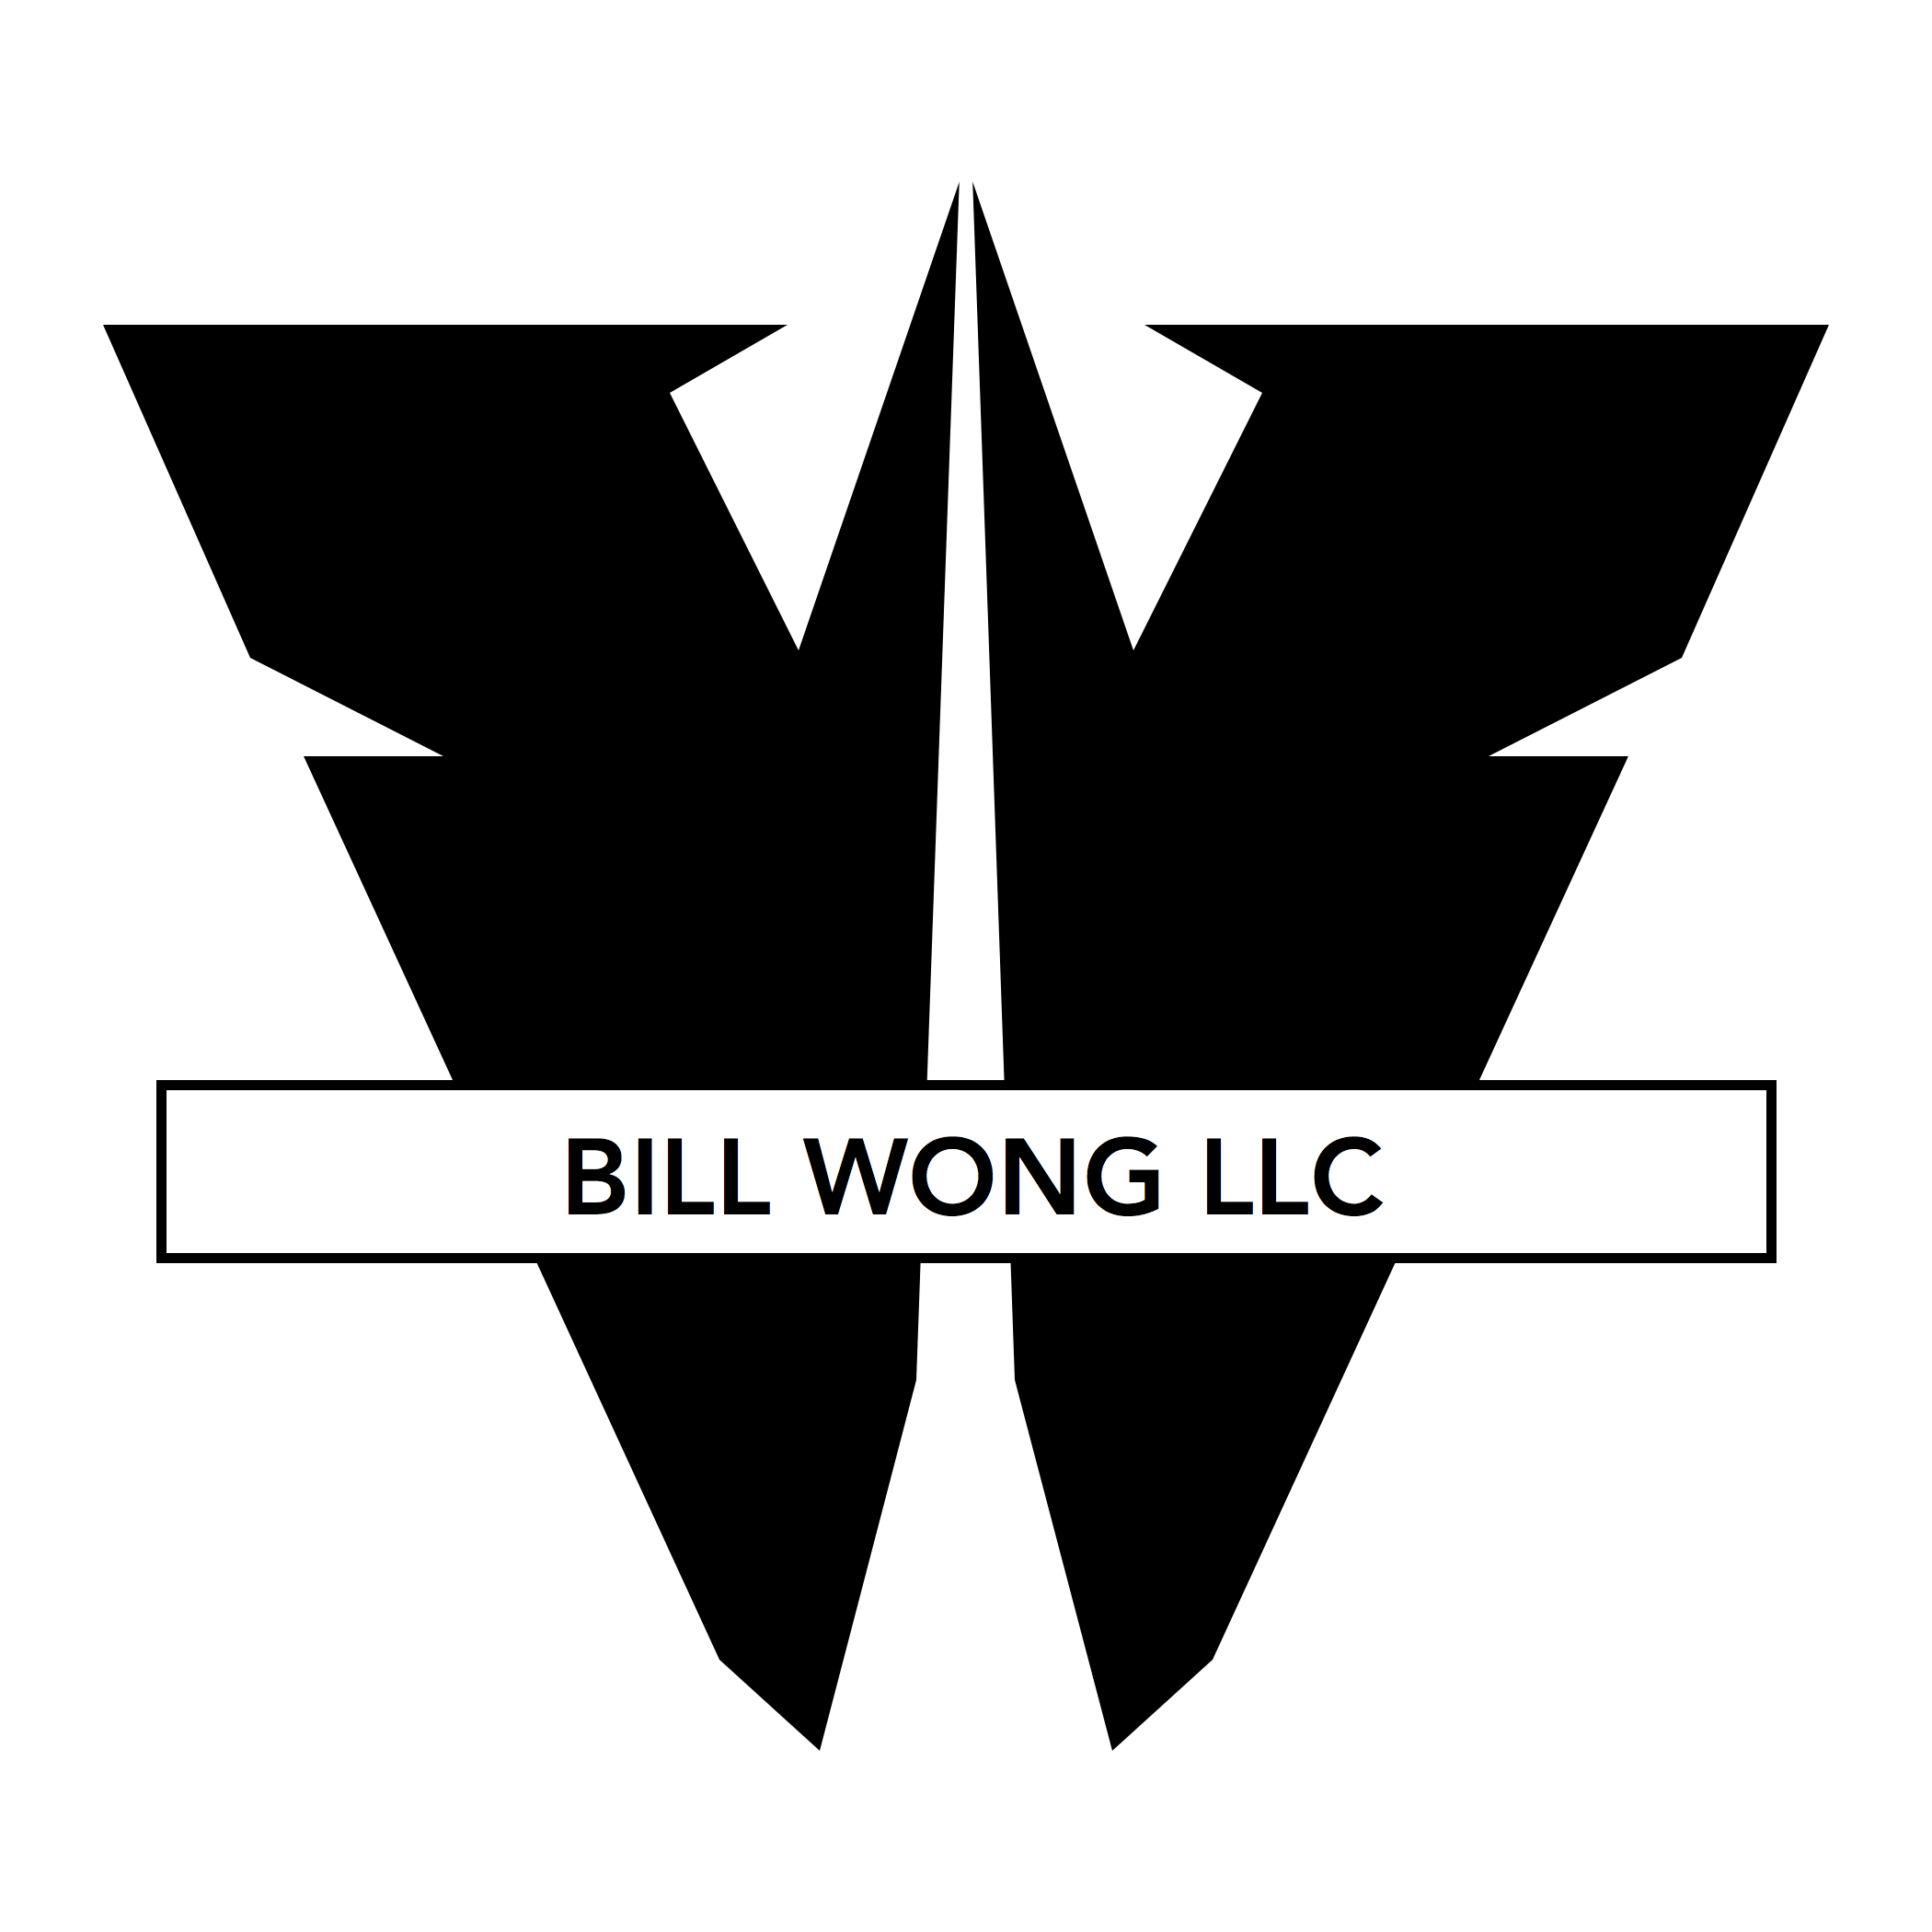 bill wong llc.png